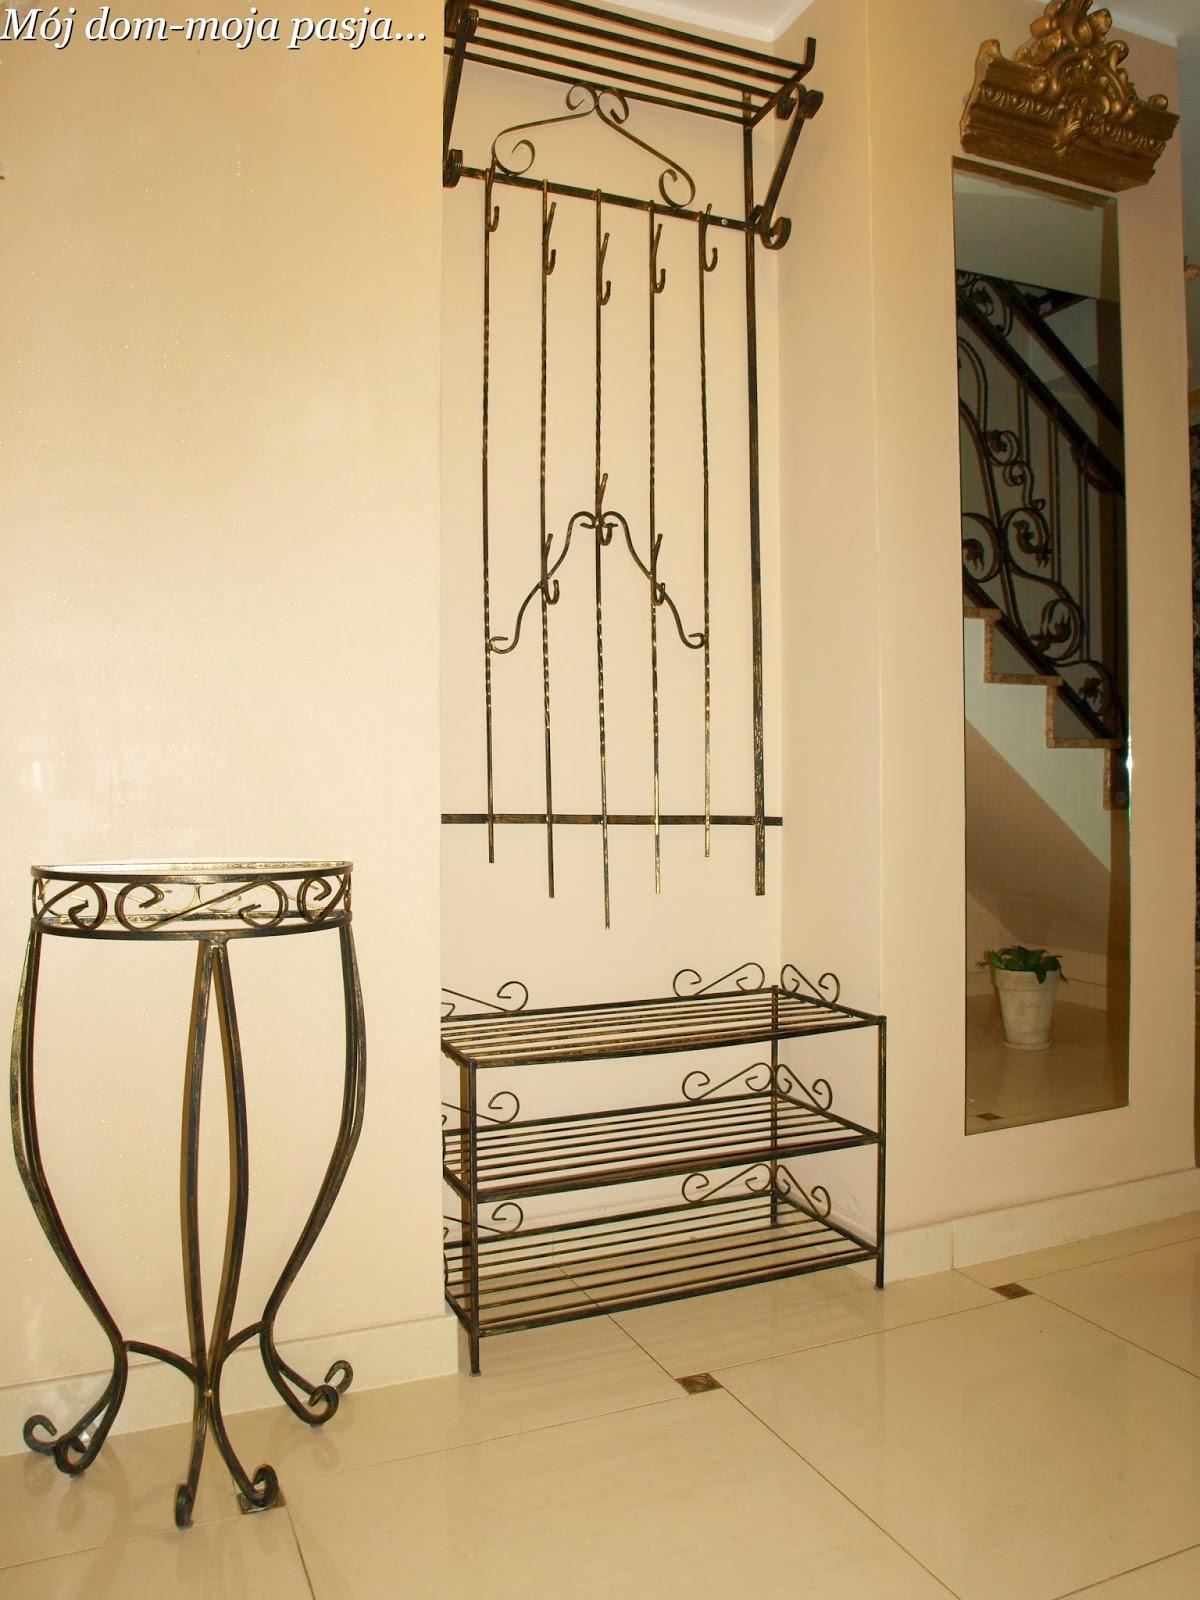 mój dom moja pasja , meble kute , metaloplastyka, dekoratornia , blogi wnętrzarskie